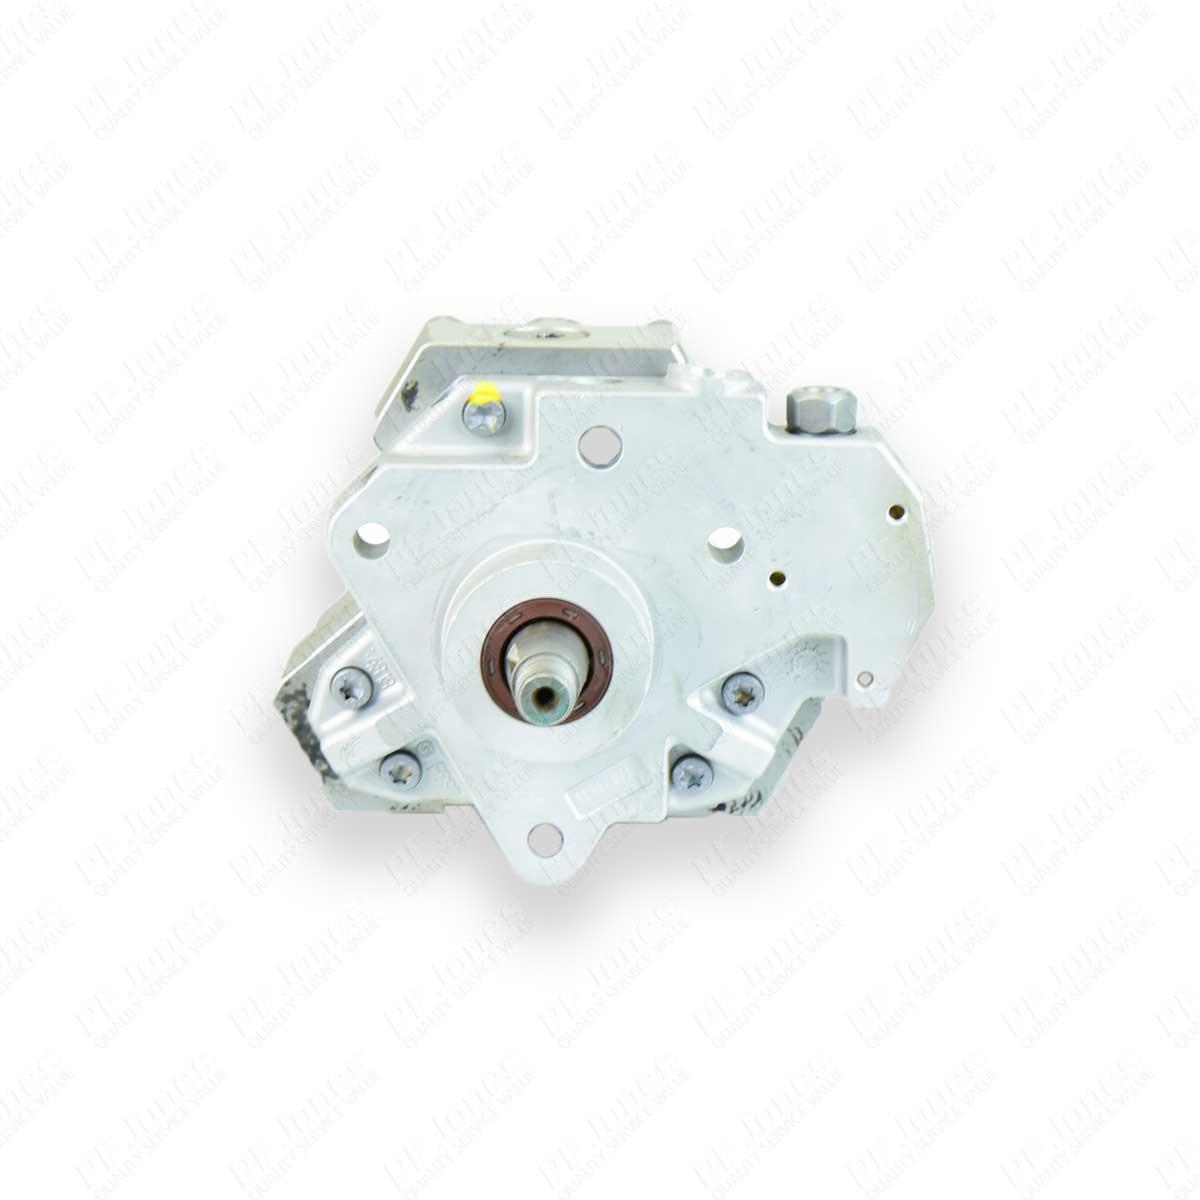 LDV Maxus 2.5 2005-Present Reconditioned Bosch Diesel Fuel Pump 0445010034